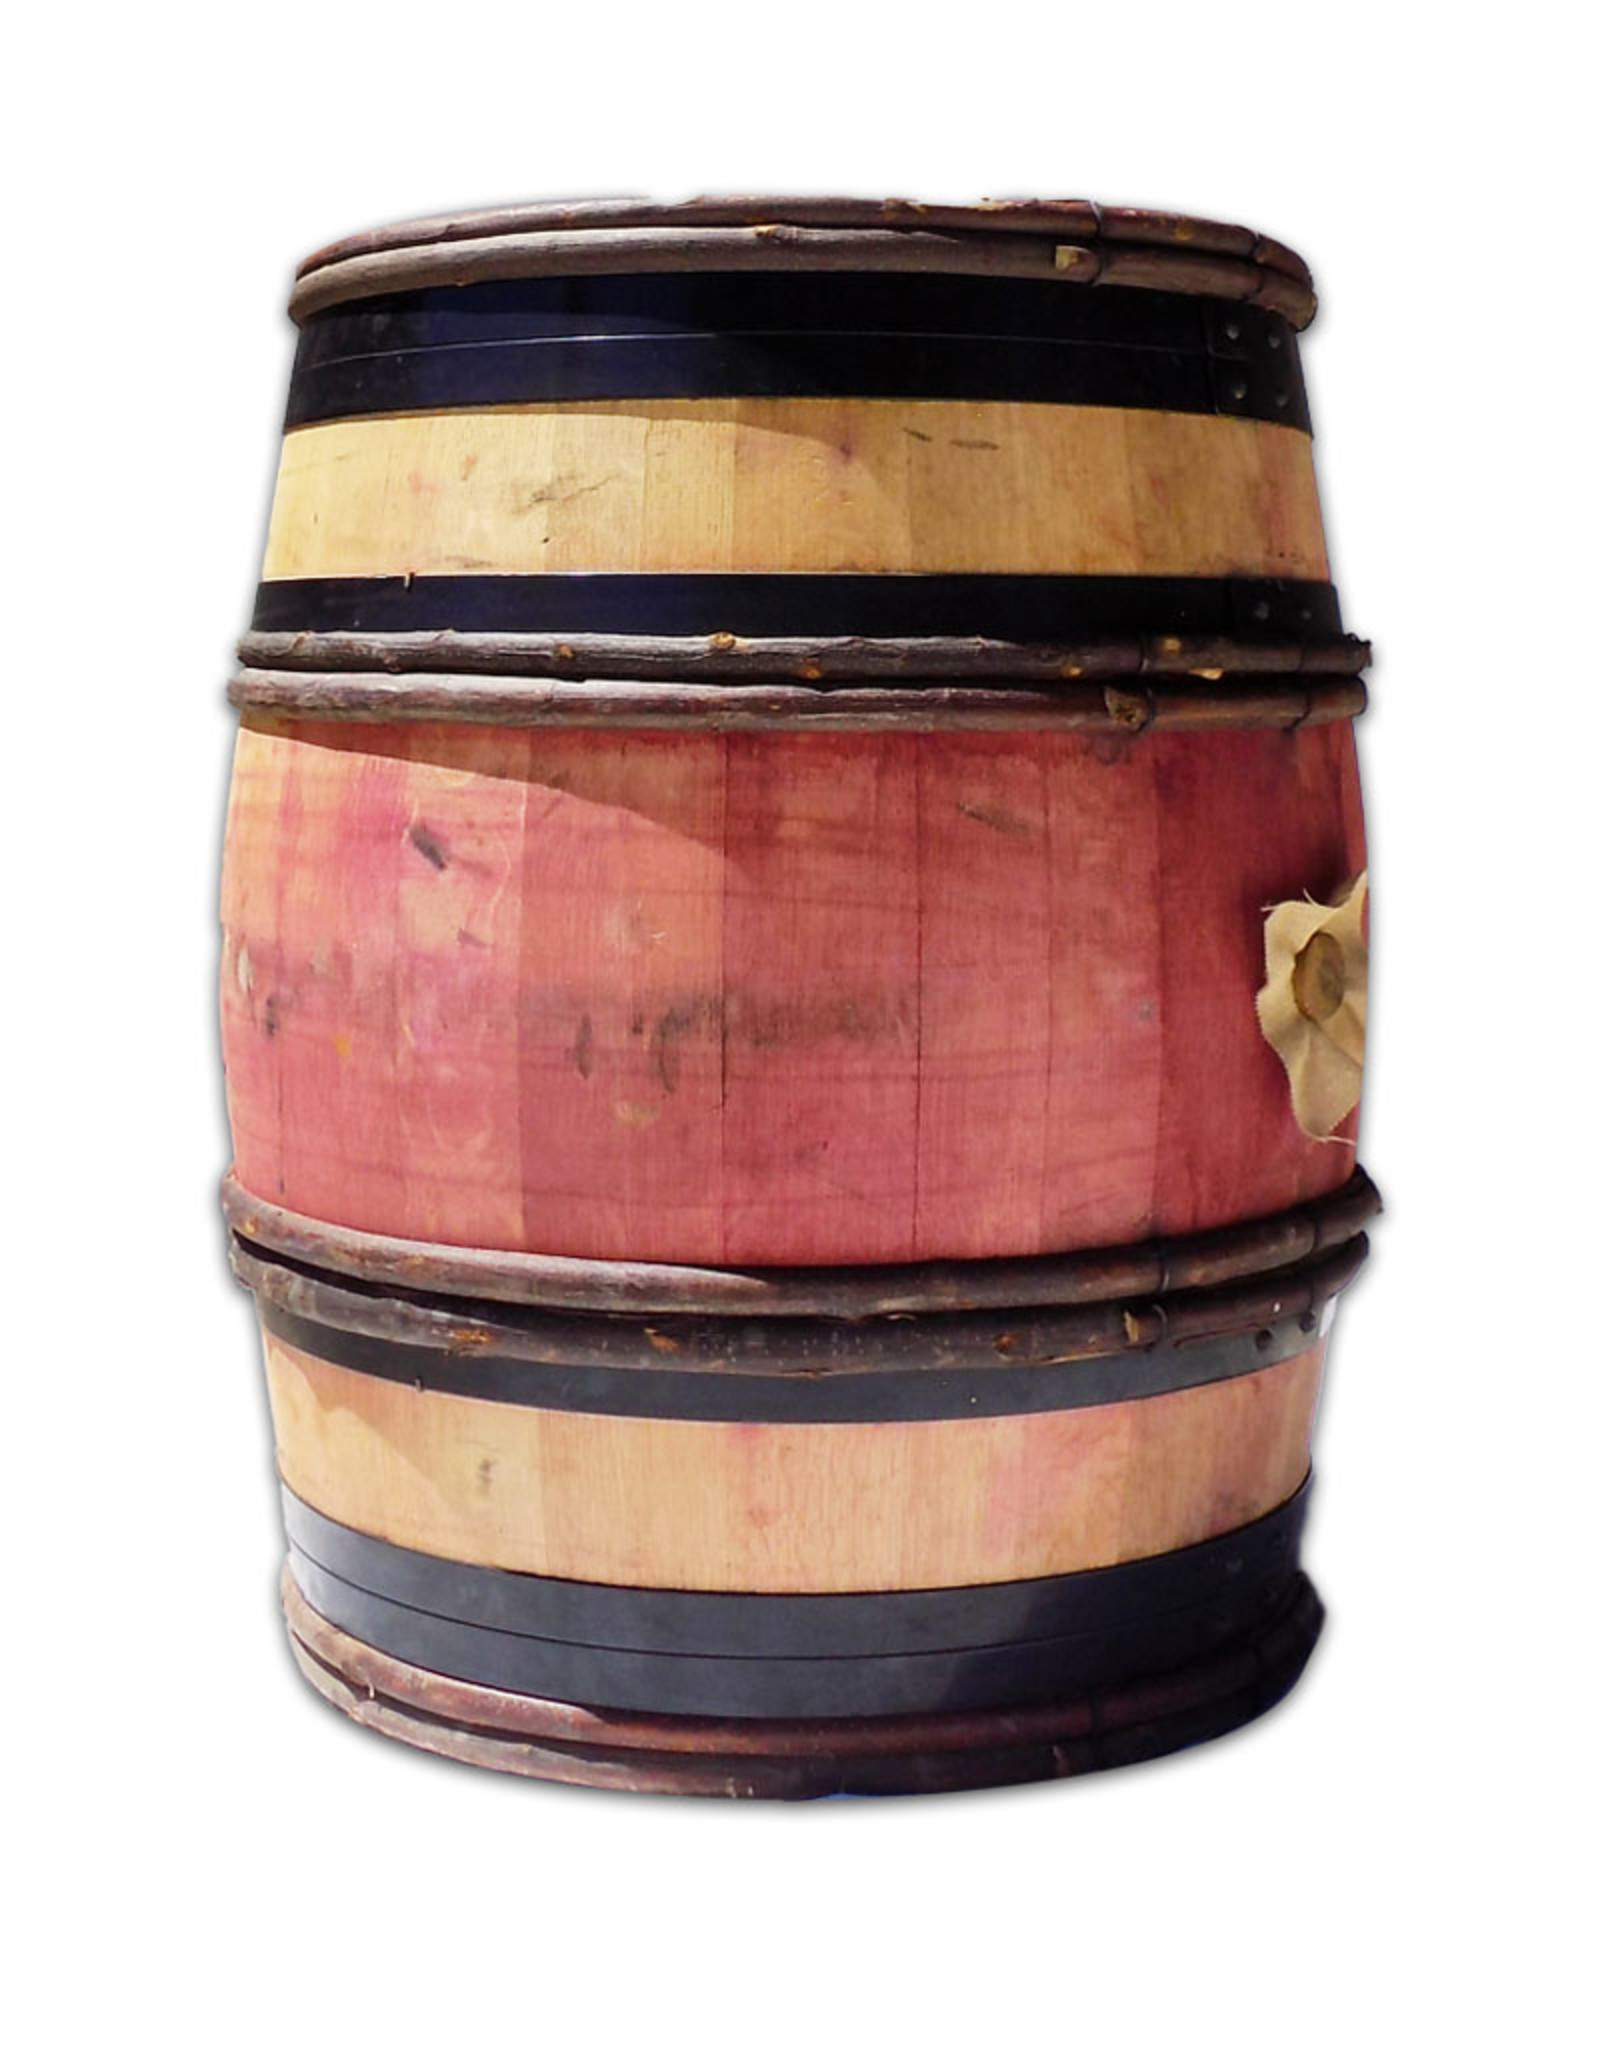 228 L RED WINE BARREL PINOT NOIR